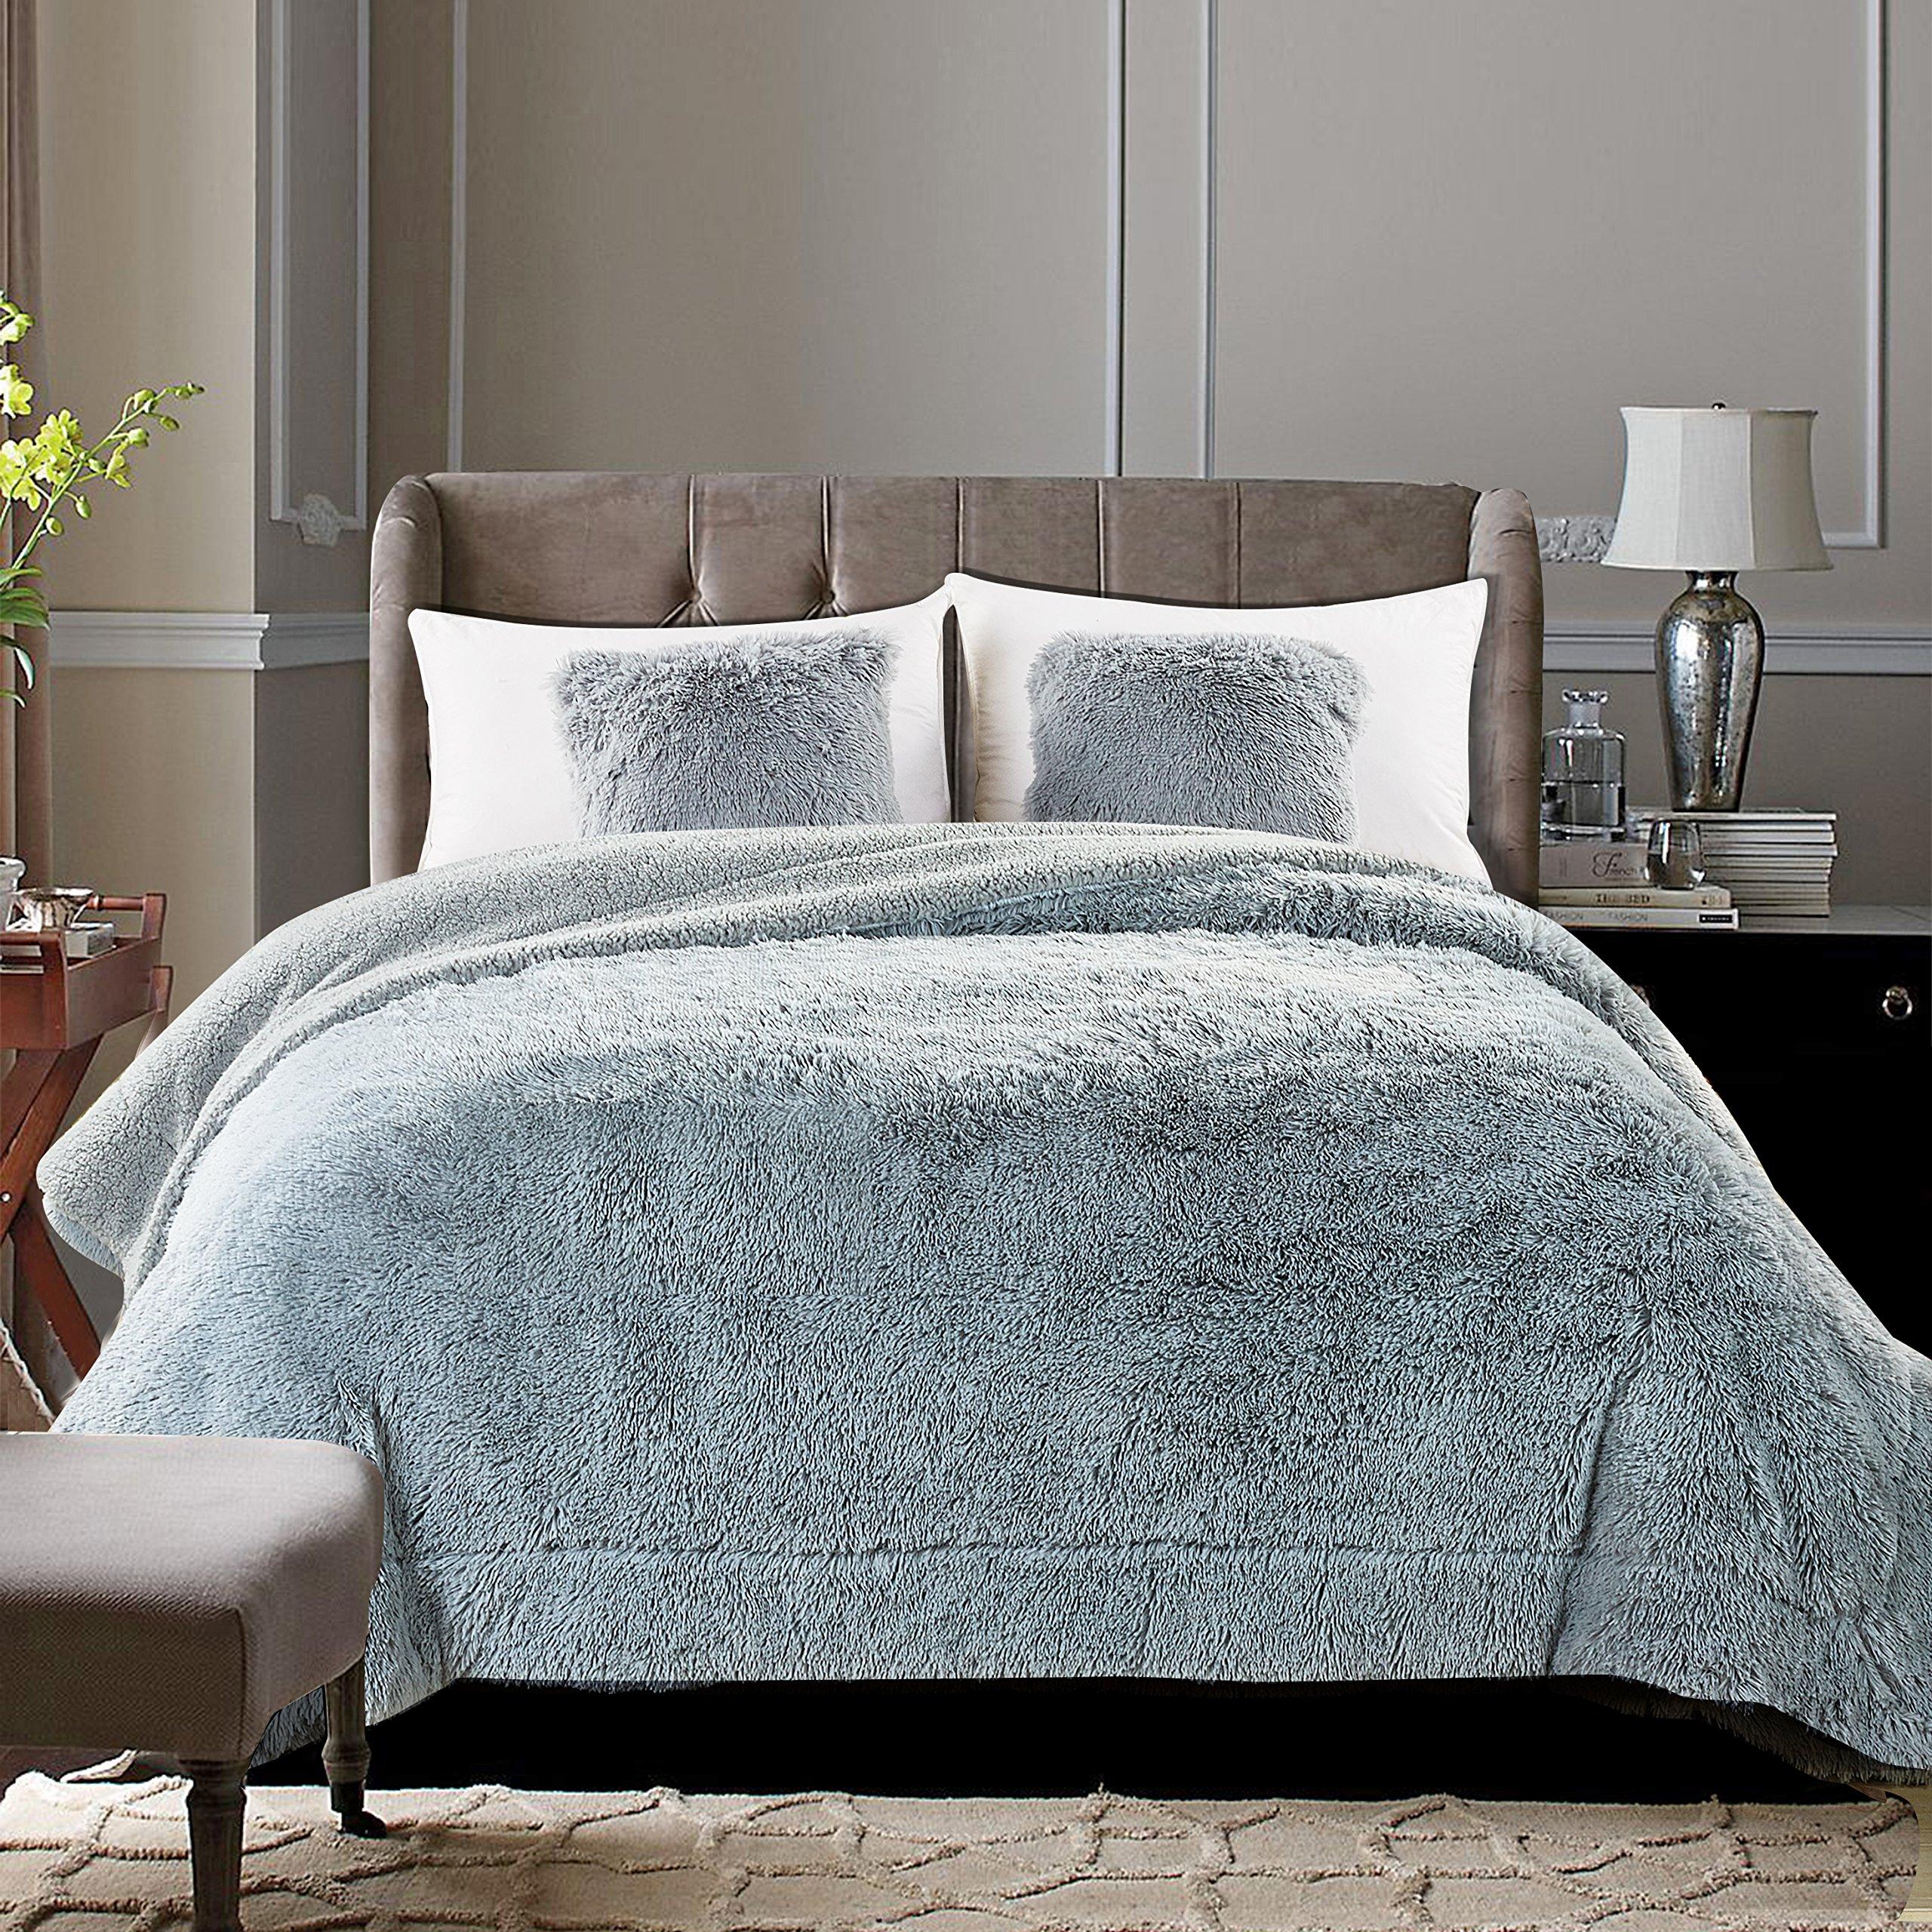 Chanasya Shaggy Longfur Faux Fur Throw Blanket - Fuzzy Lightweight Plush Sherpa Fleece Microfiber Blanket - for Couch Bed Chair Photo Props - Twin - Grey